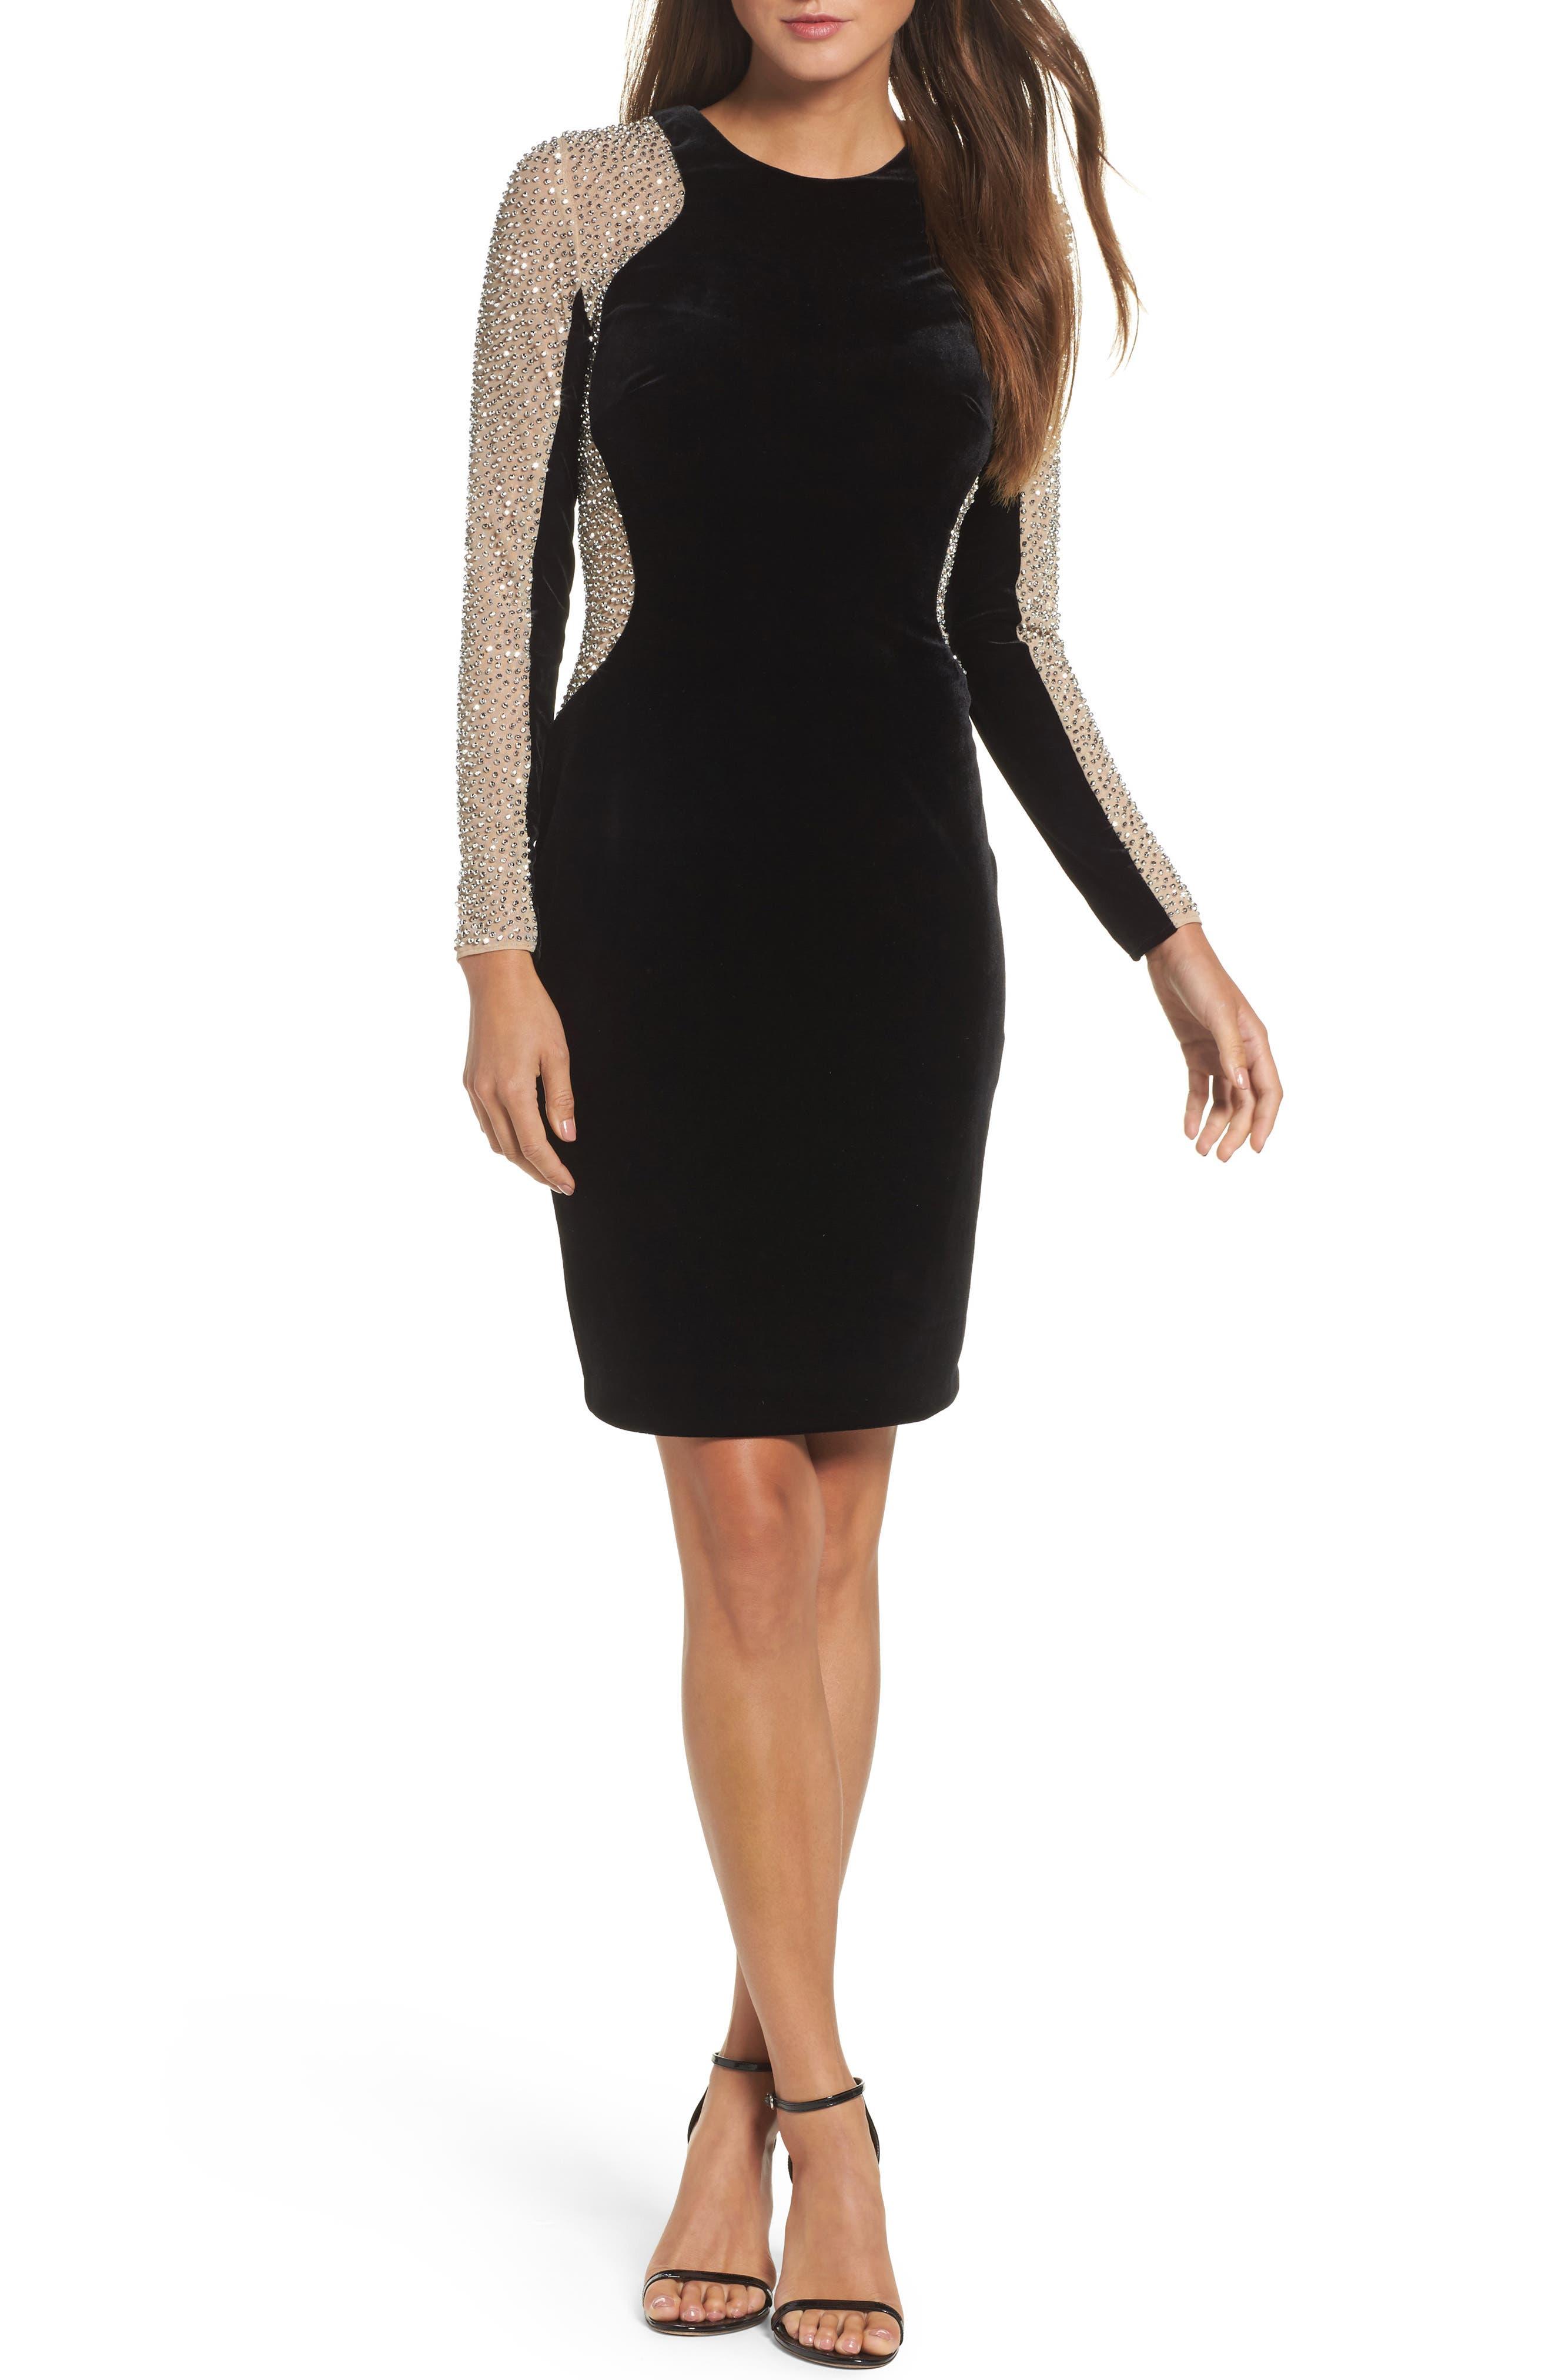 Xscape Caviar Bead Mesh Velvet Body-Con Dress